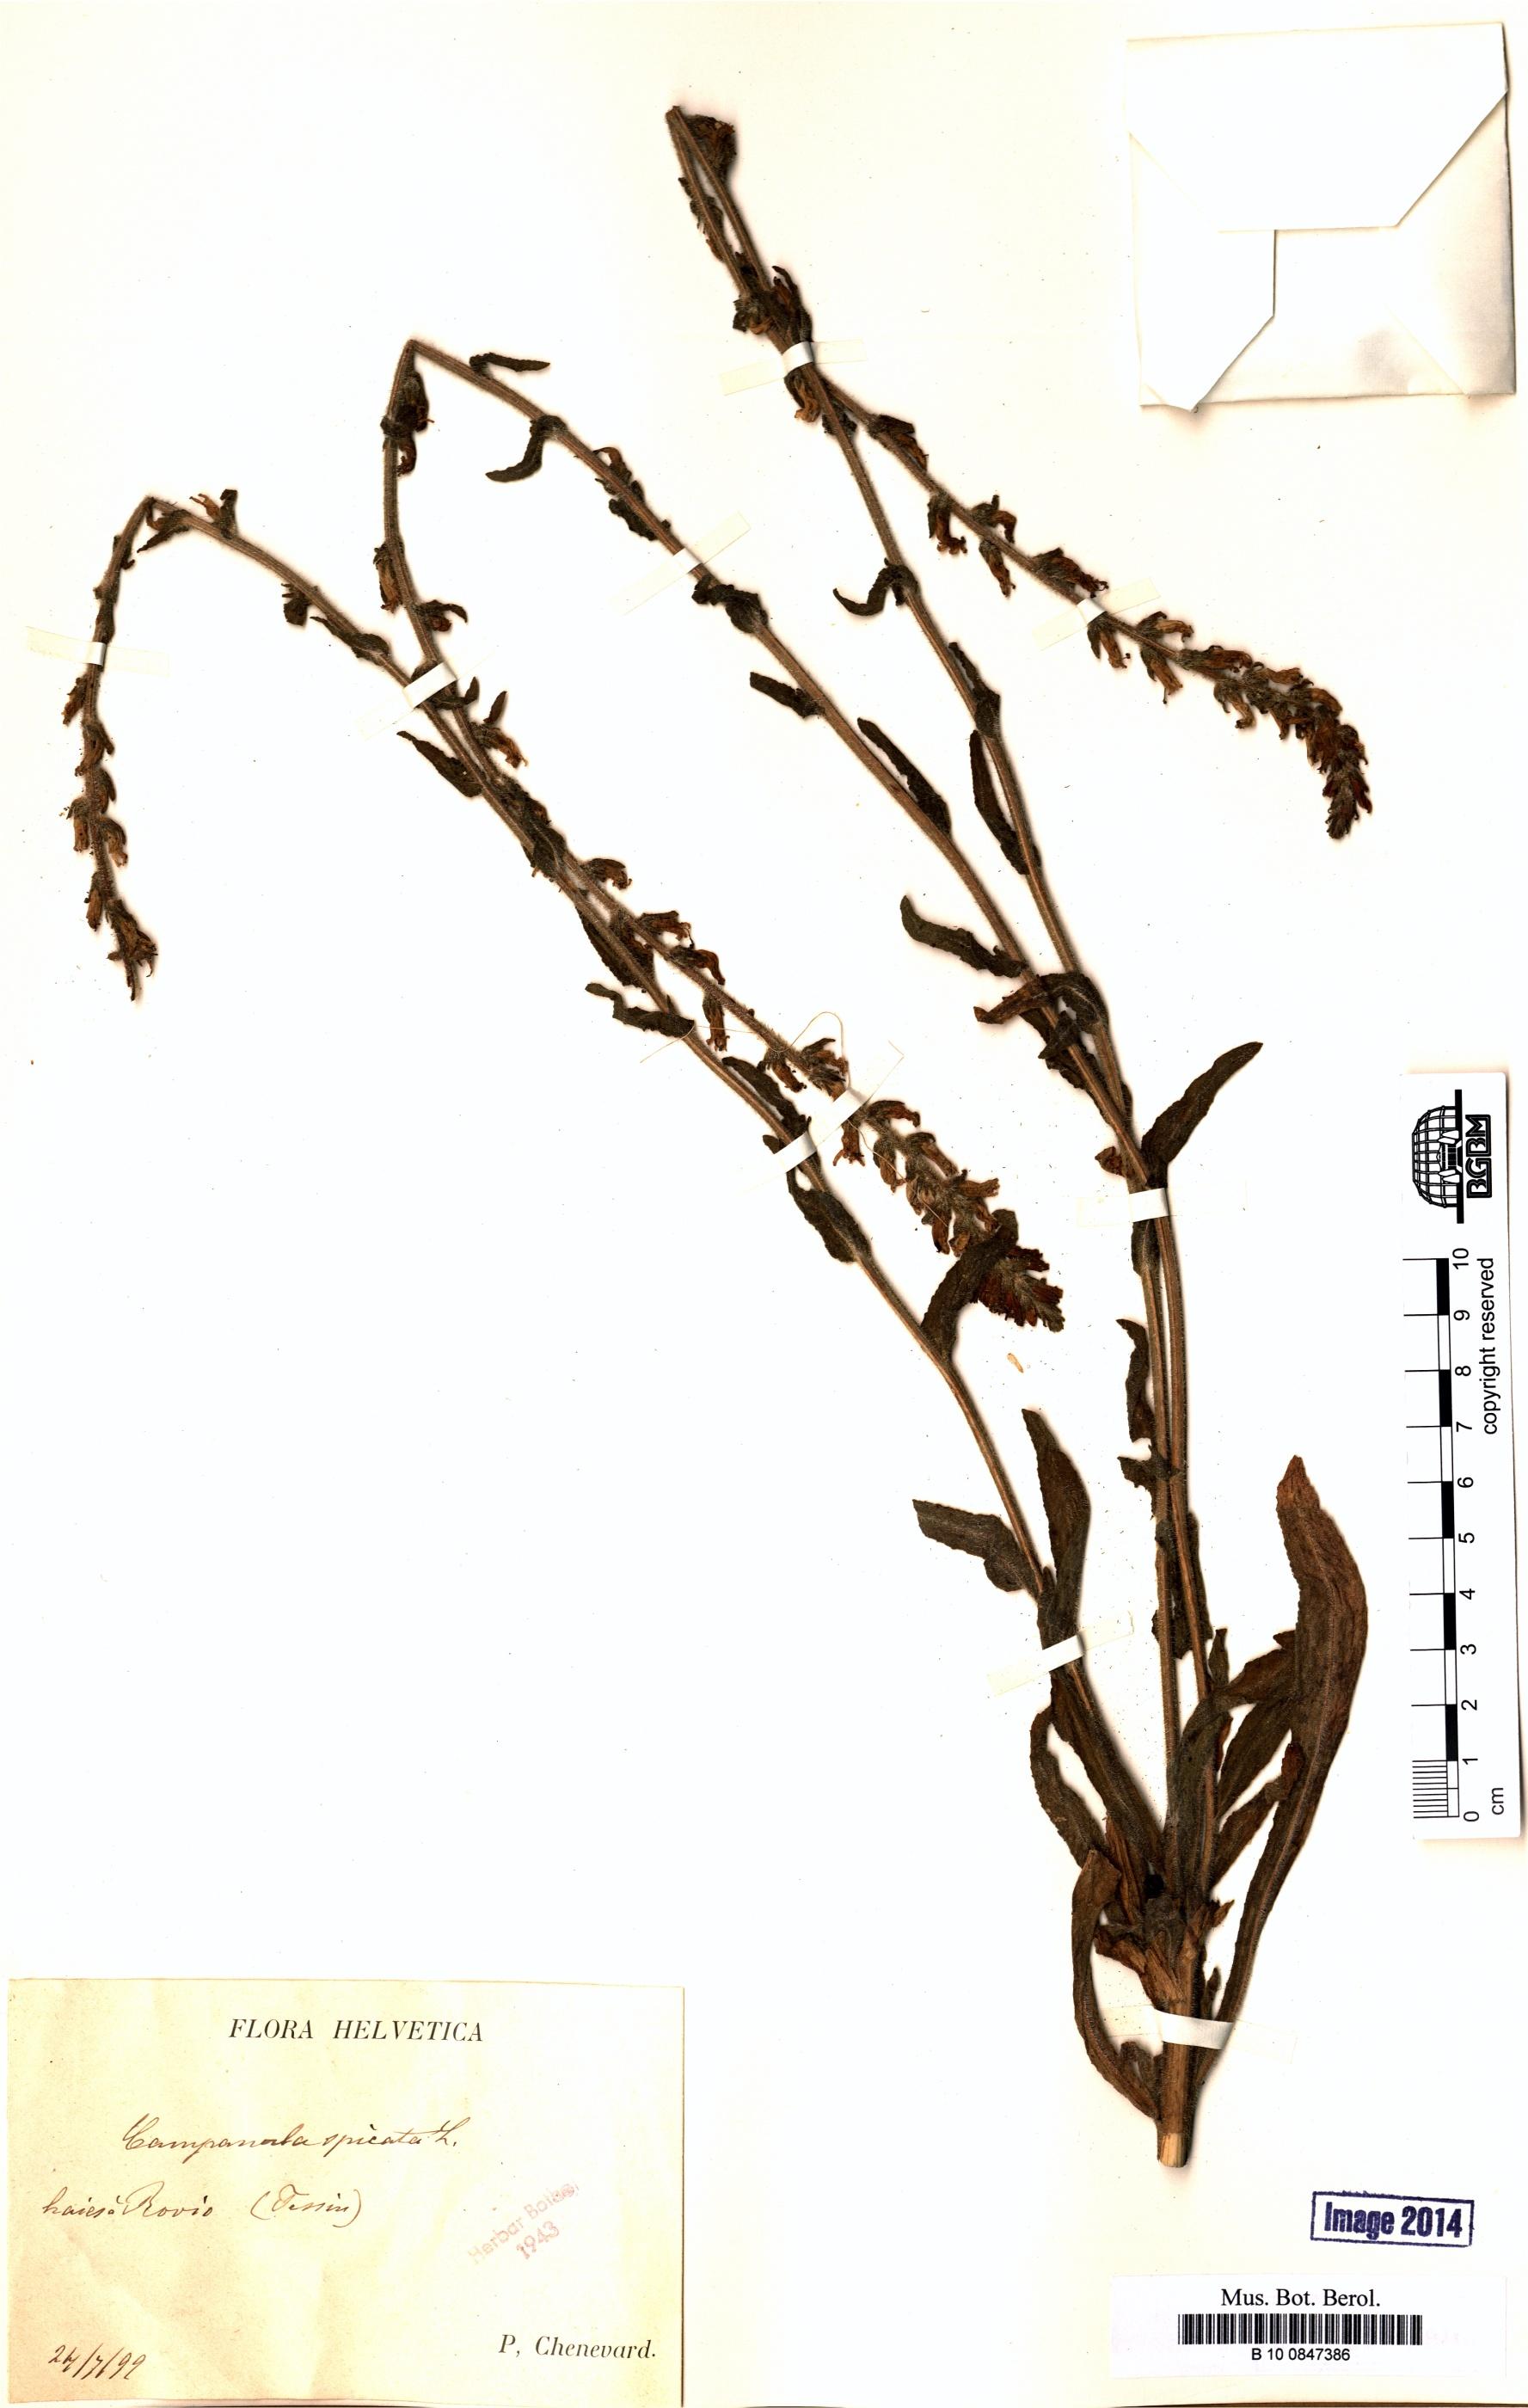 http://ww2.bgbm.org/herbarium/images/B/10/08/47/38/B_10_0847386.jpg